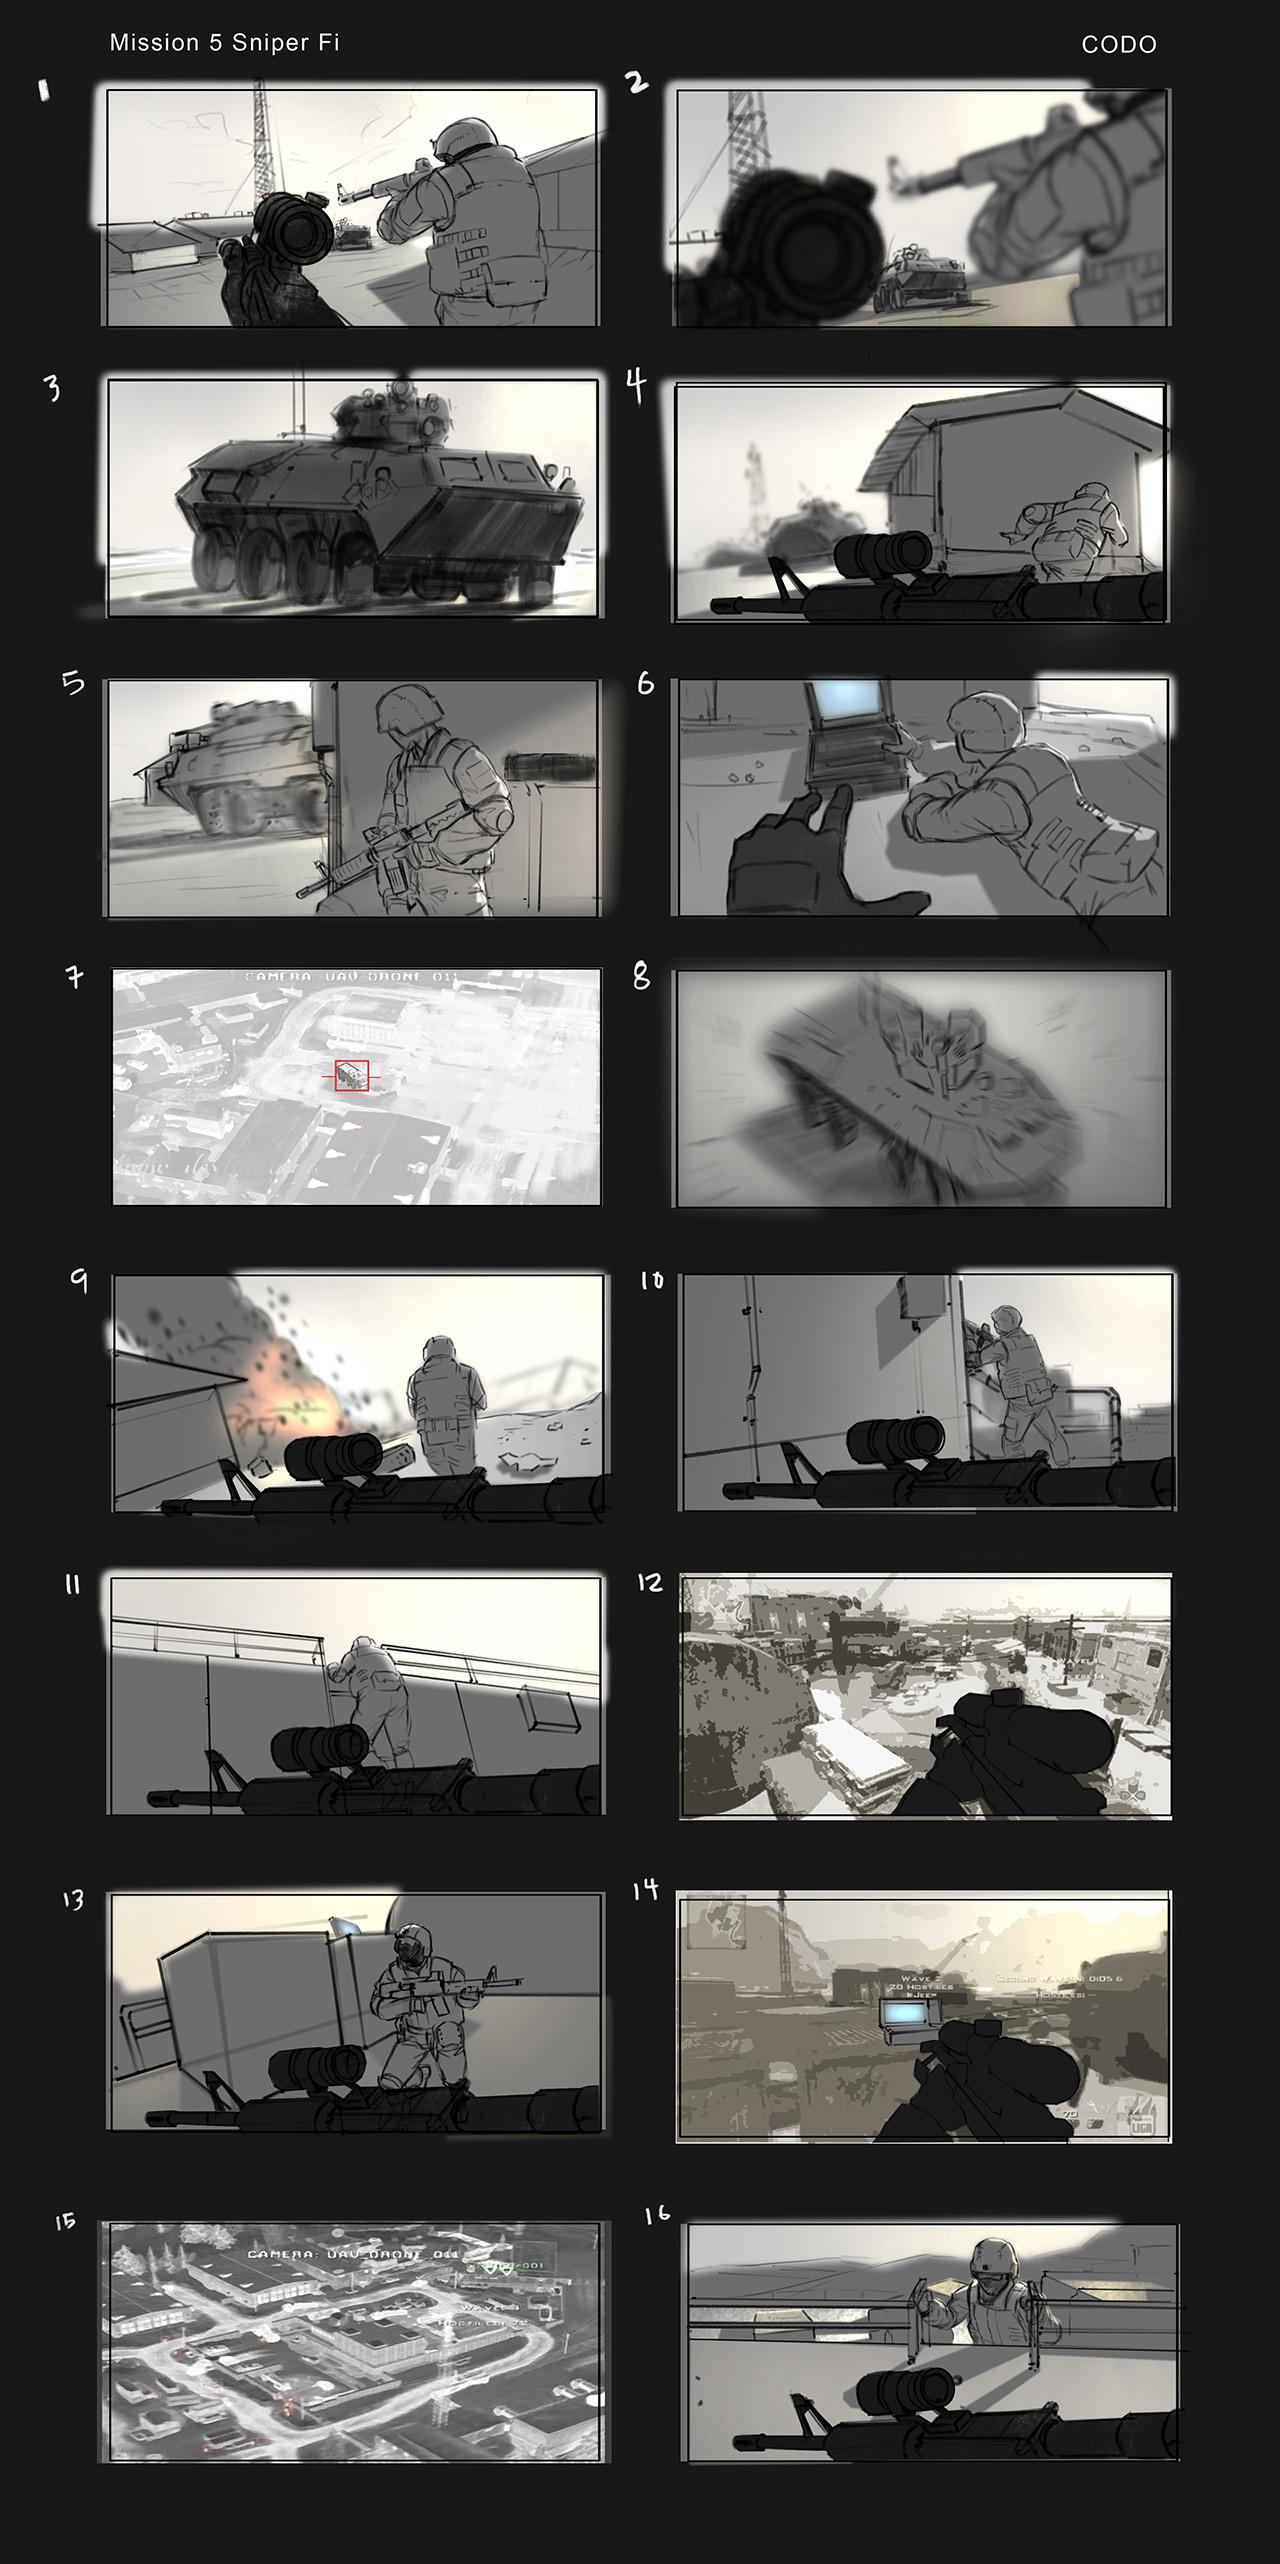 sniper_fi_storyboard.jpg